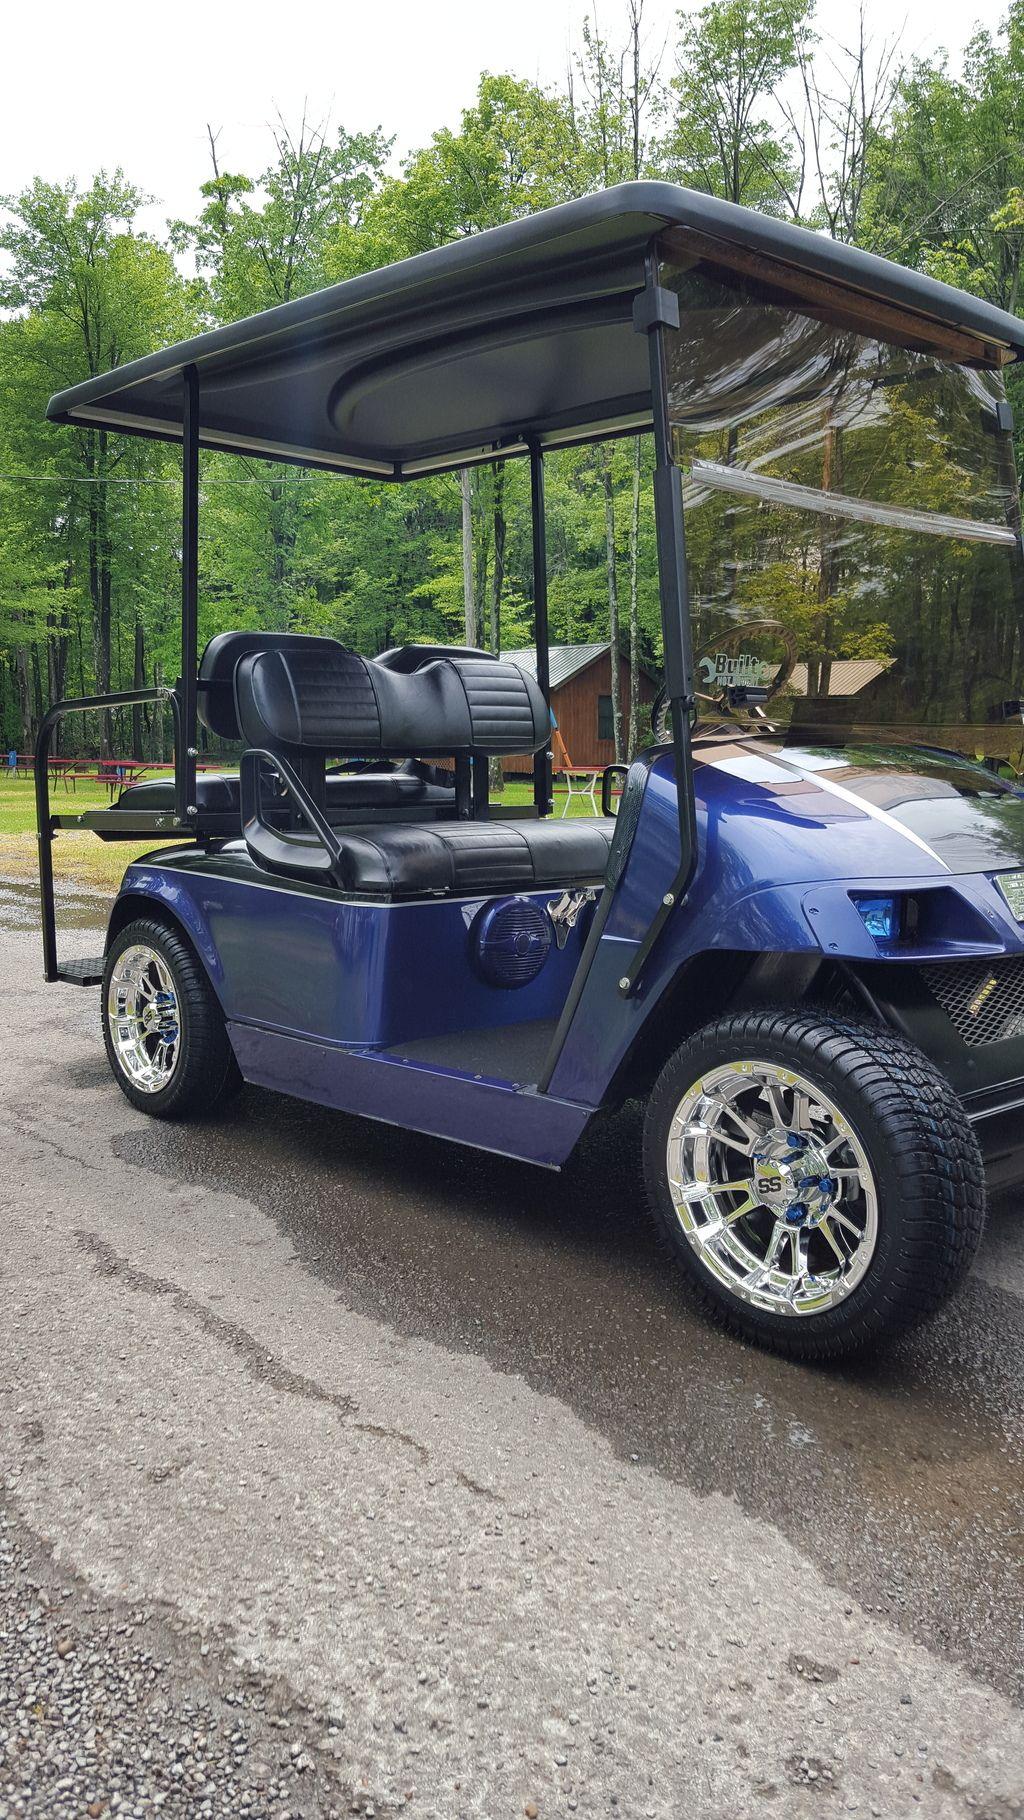 06 Ezgo Build Air Ride Custom Dash Tv And Much More Page 8 Golf Carts Air Ride Ezgo Golf Cart